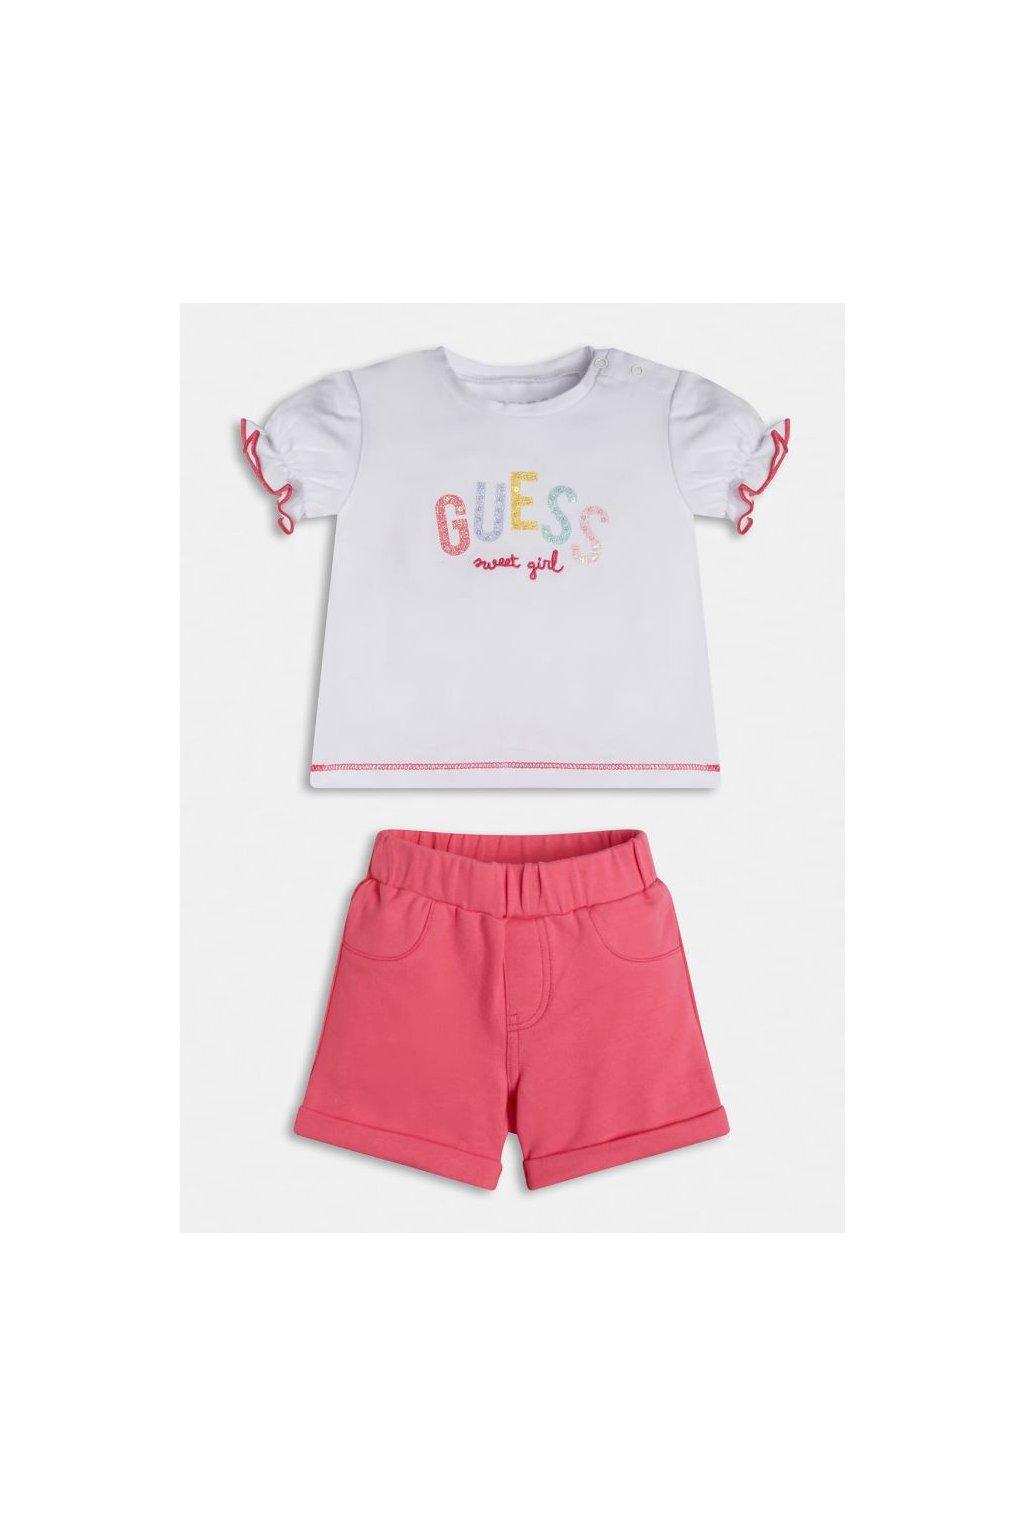 BabyGirlSet2